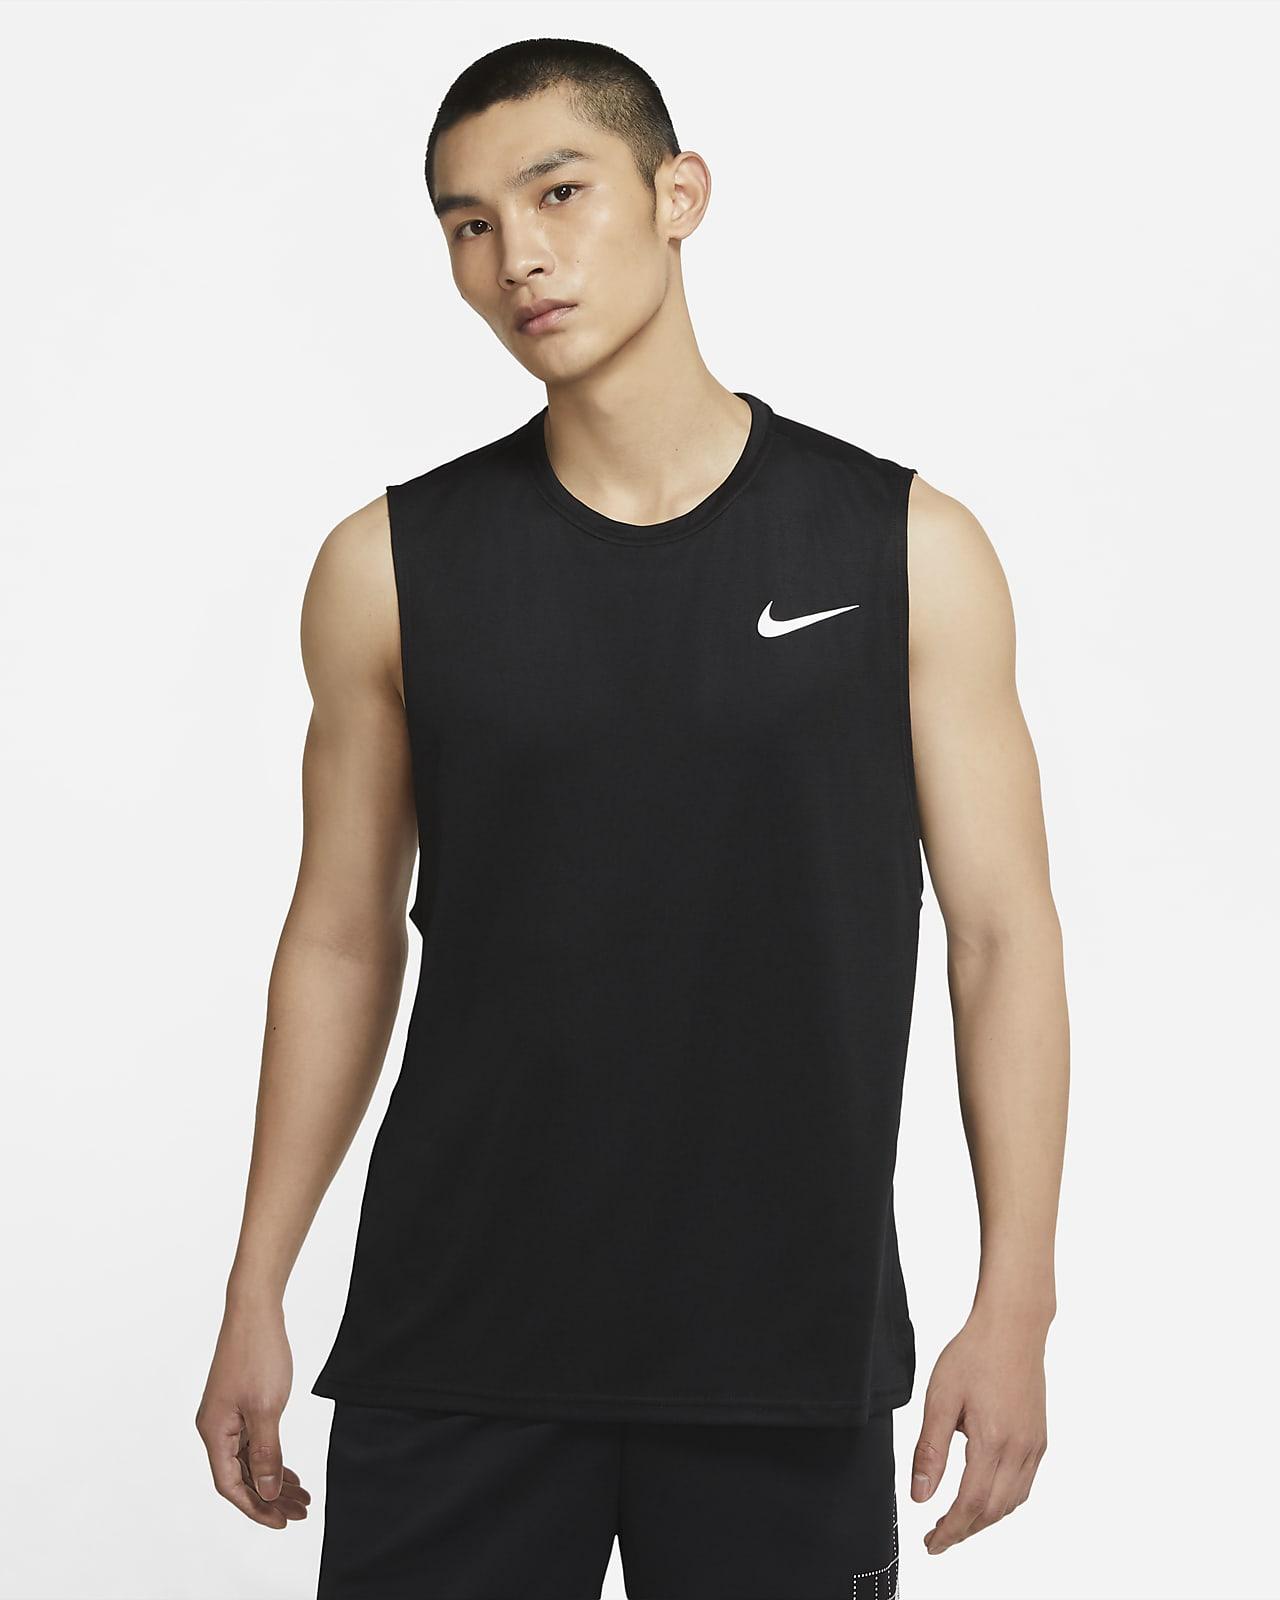 Nike Dri-FIT Superset Men's Training Tank